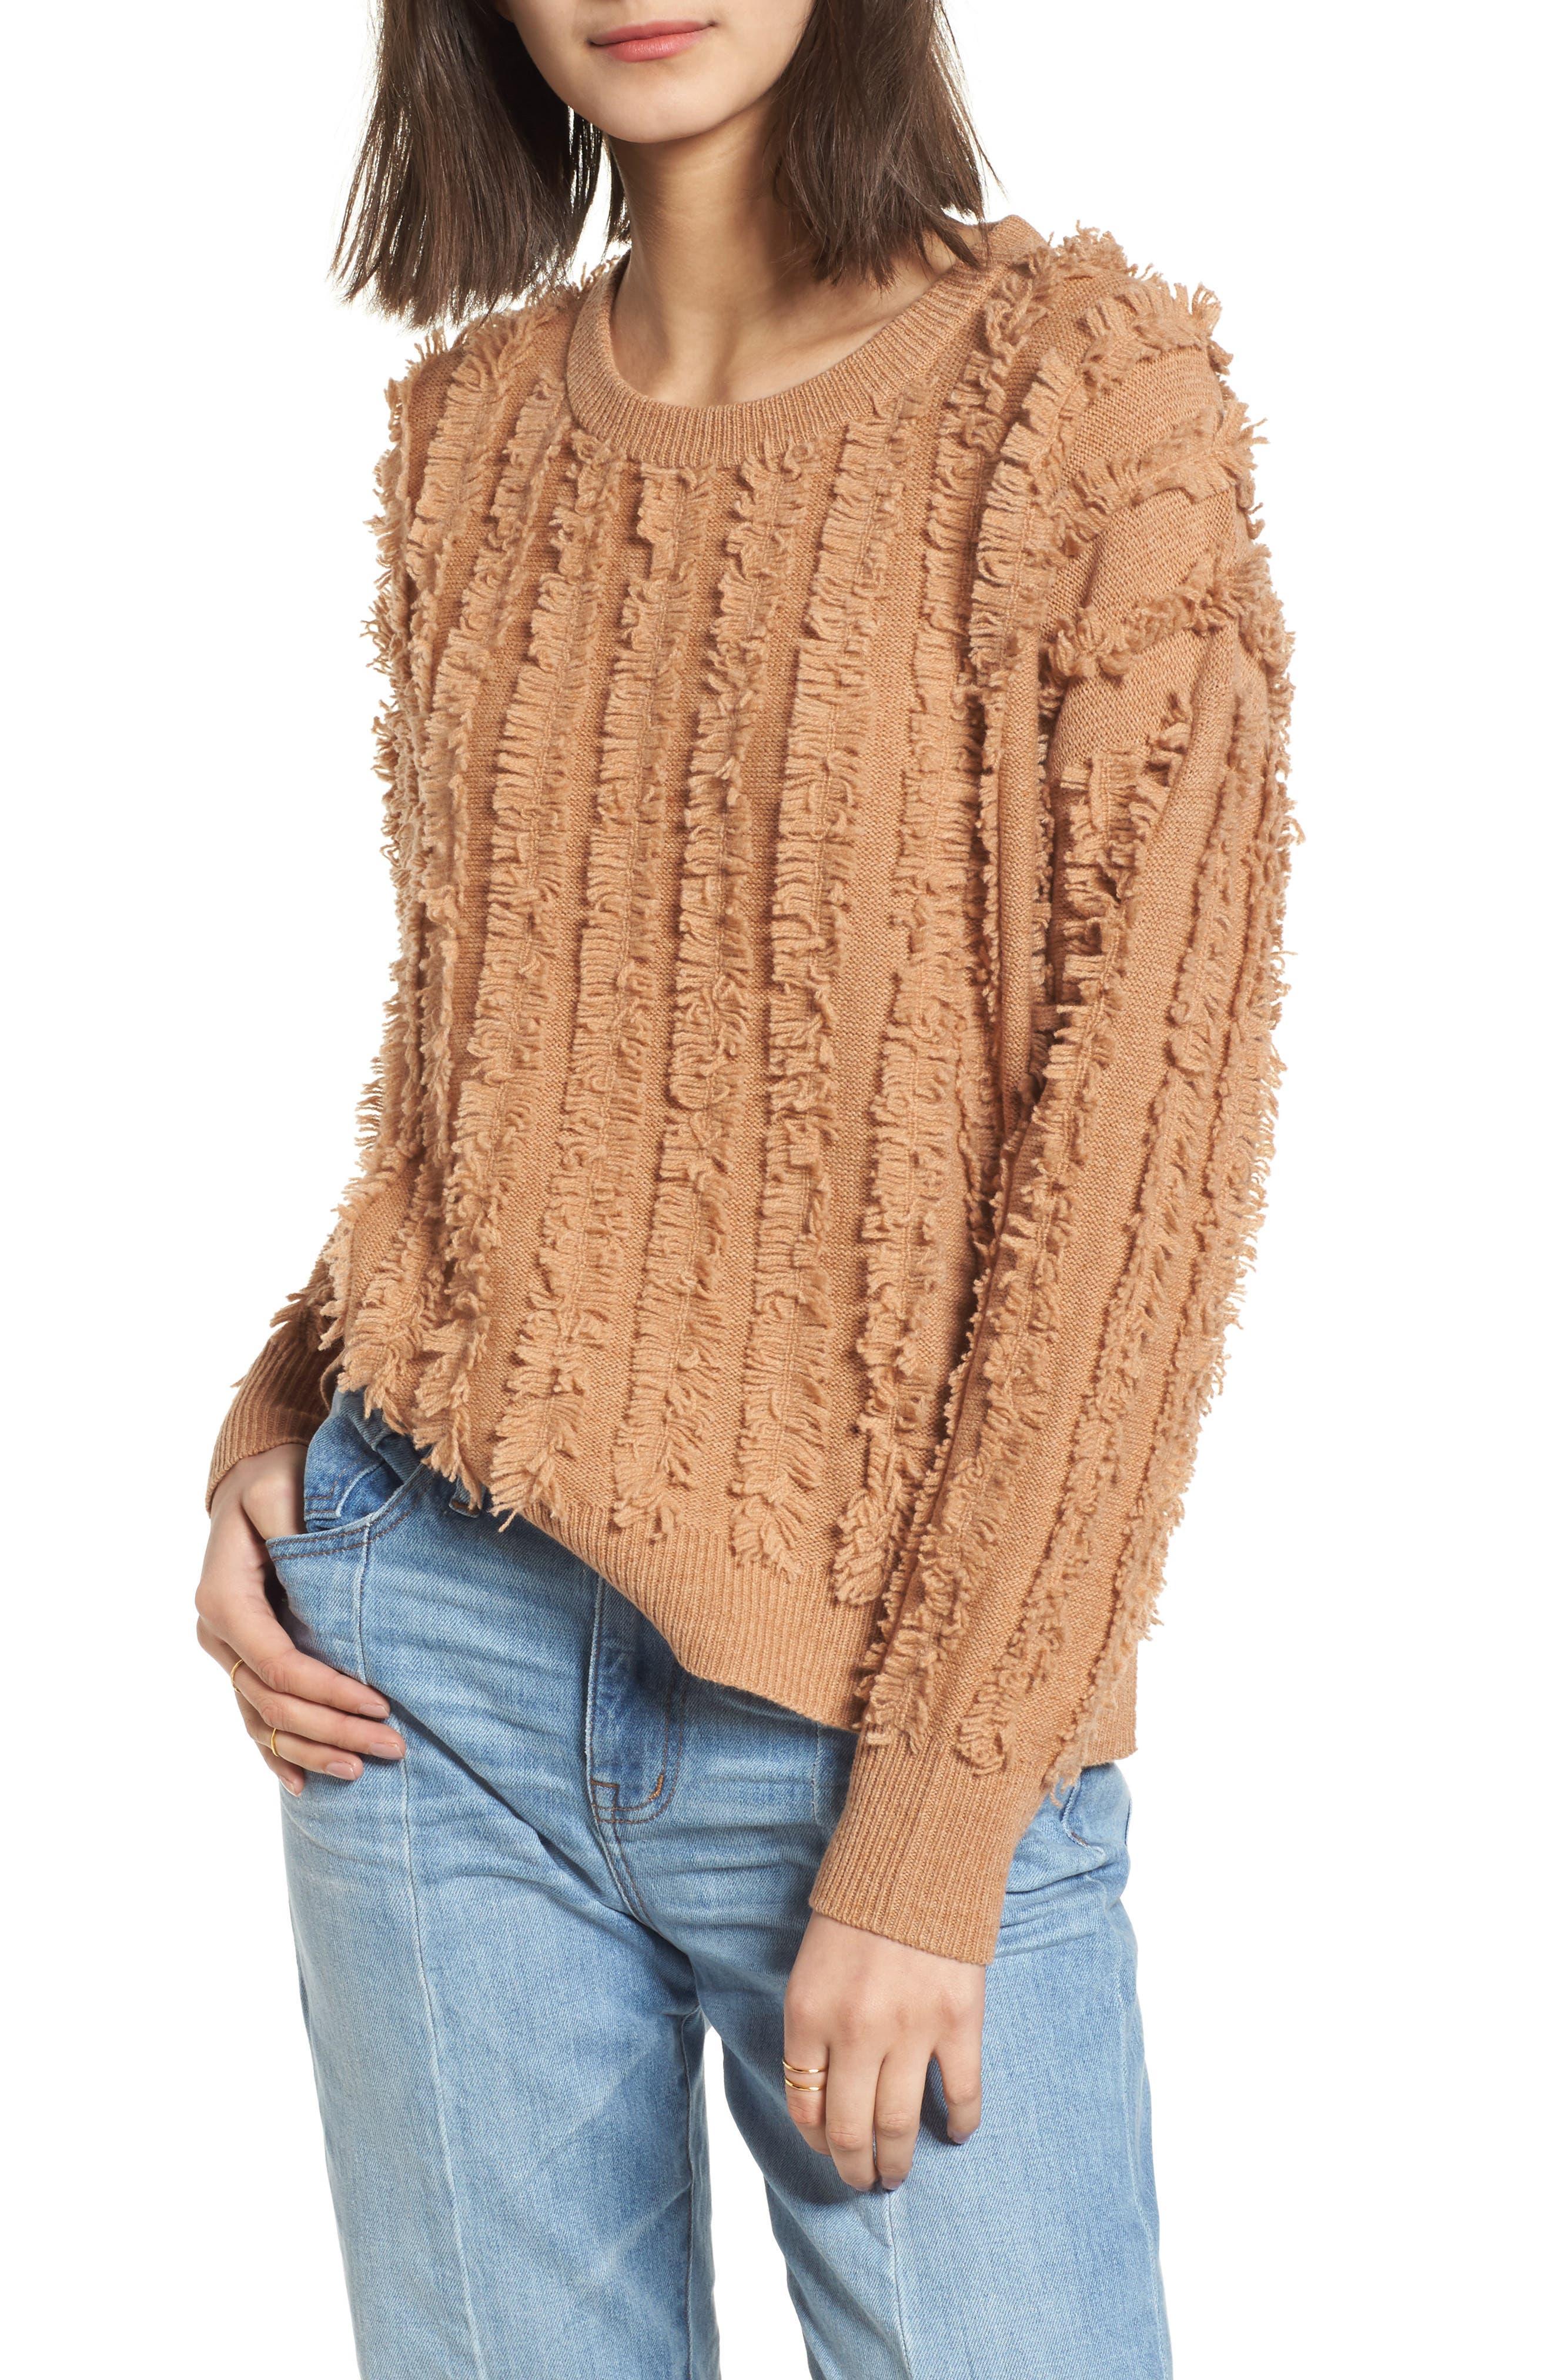 Alternate Image 1 Selected - Madewell Fringe Stripe Pullover Sweater